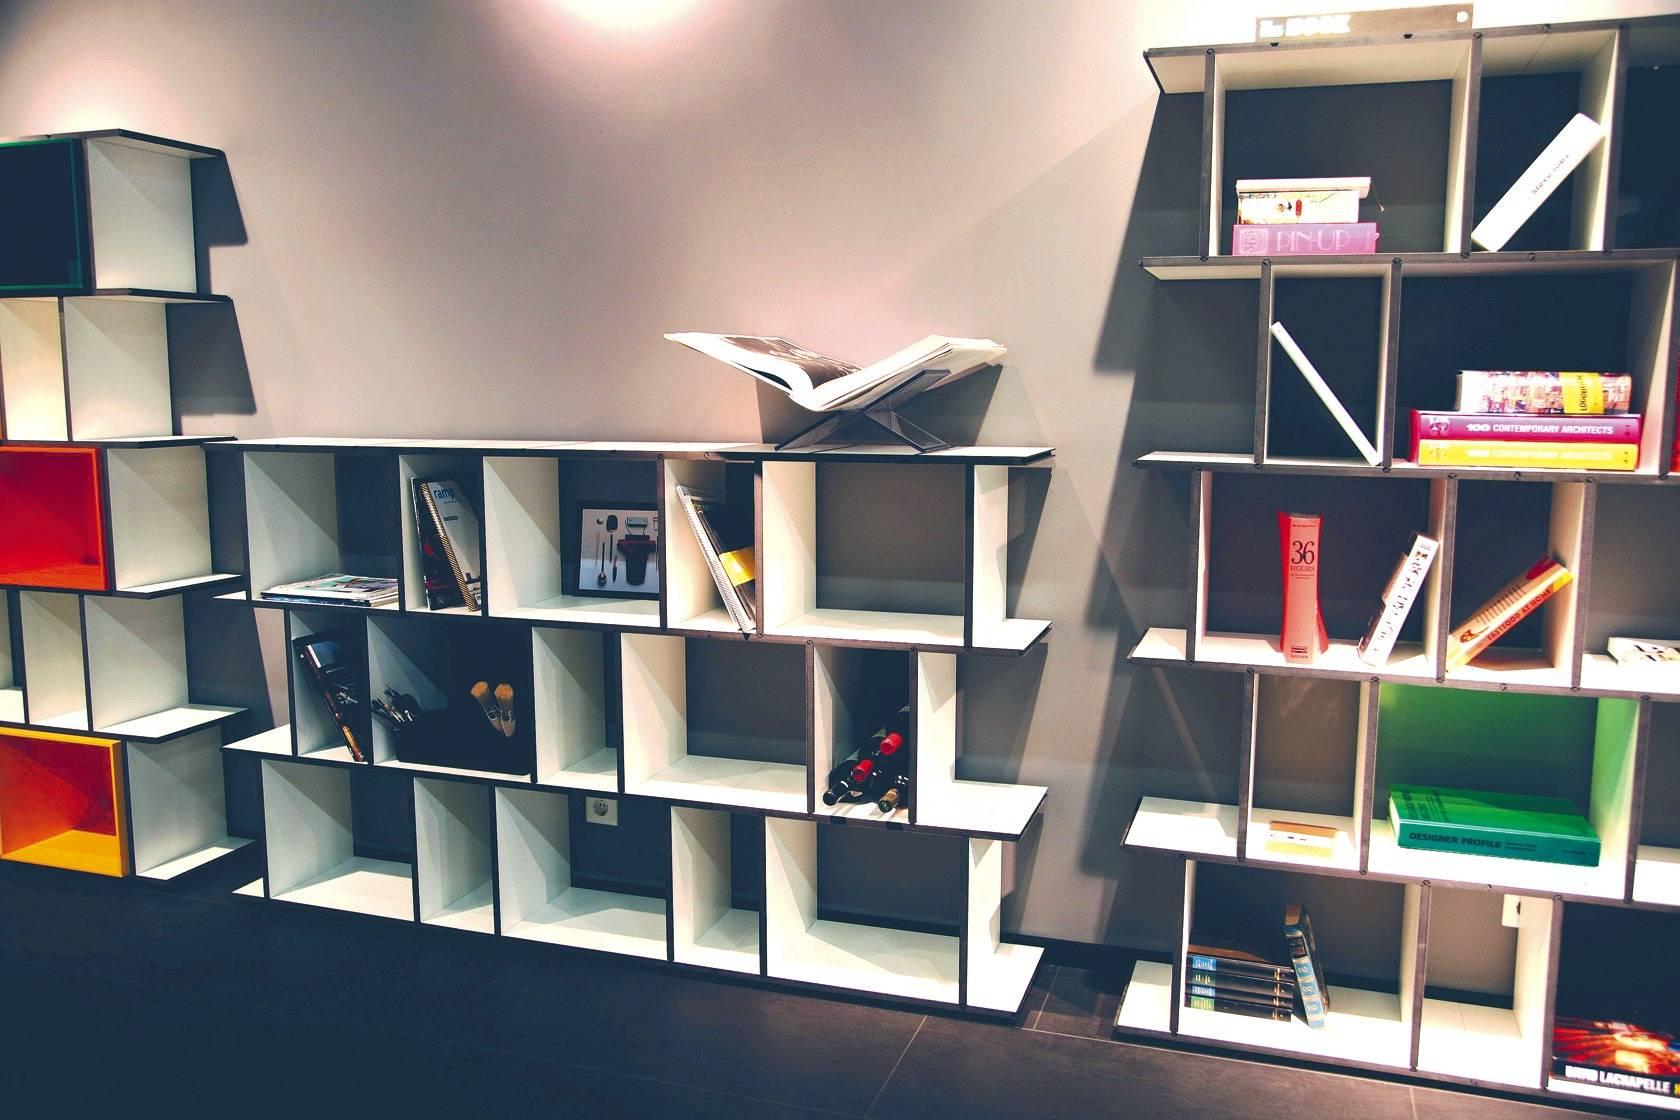 regale aus flexiblen modulen wie baukl tzchen f r erwachsene lebensart rhein neckar zeitung. Black Bedroom Furniture Sets. Home Design Ideas